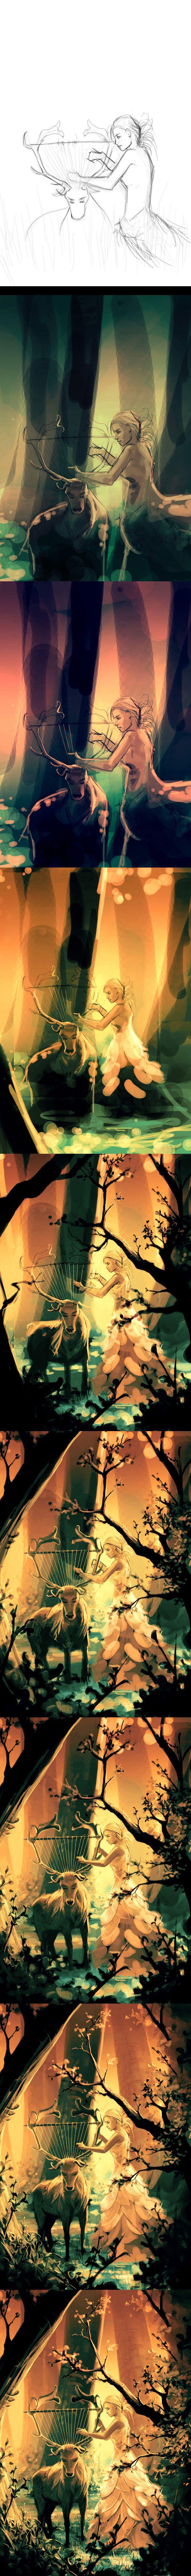 WIP Feral strings by AquaSixio.deviantart.com on @deviantART